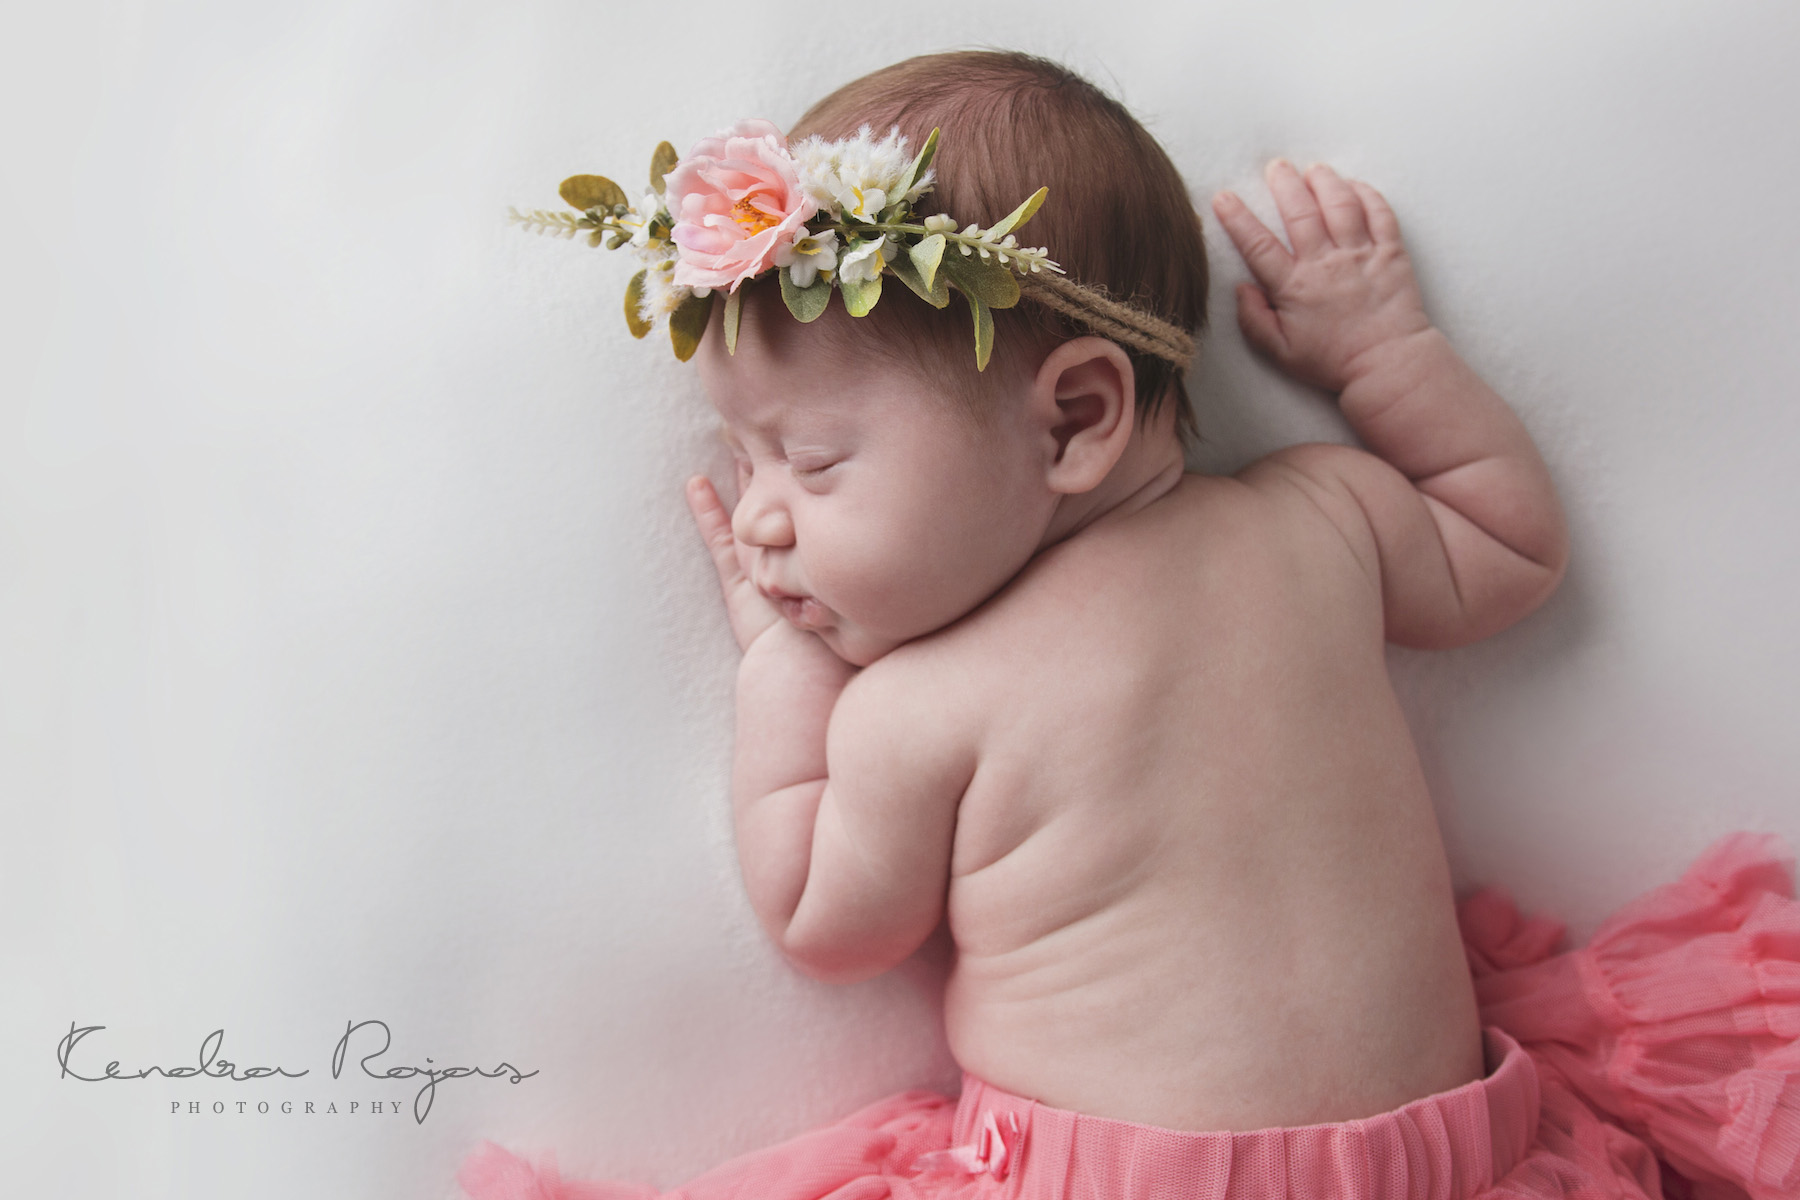 Newborn_Charlotte 112216_03_LOW_Social.jpg